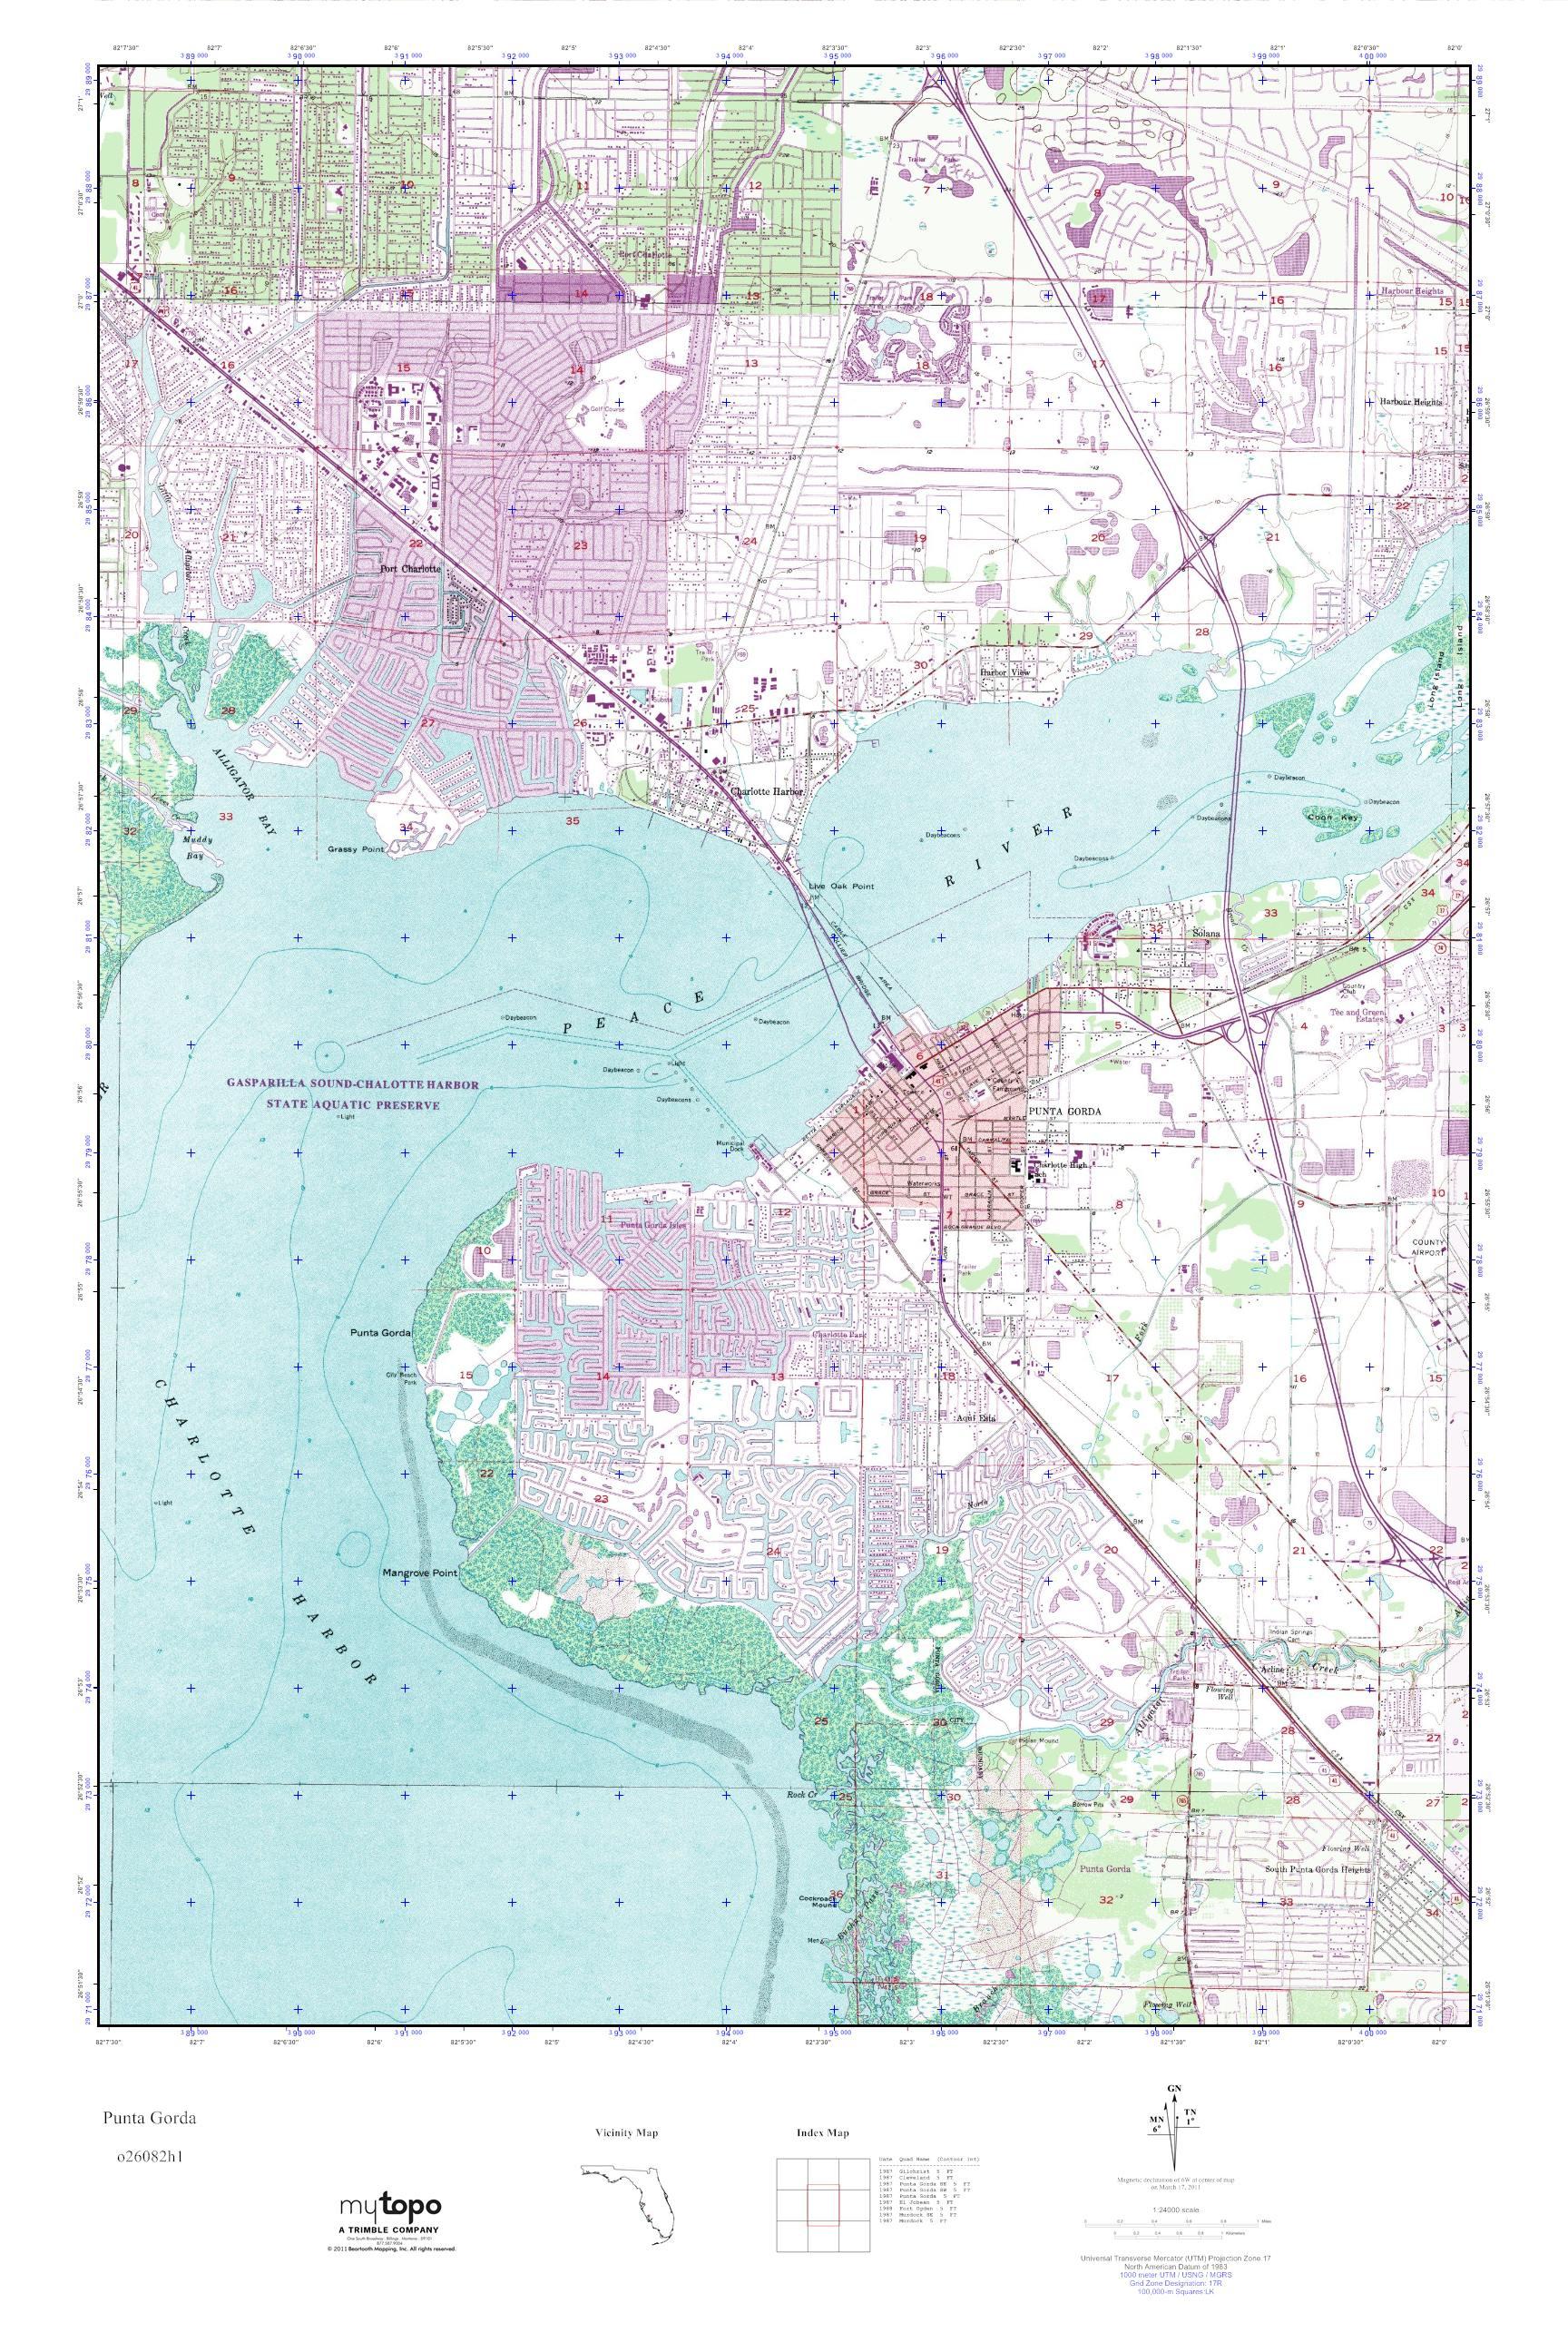 Mytopo Punta Gorda, Florida Usgs Quad Topo Map - Punta Gorda Florida Map